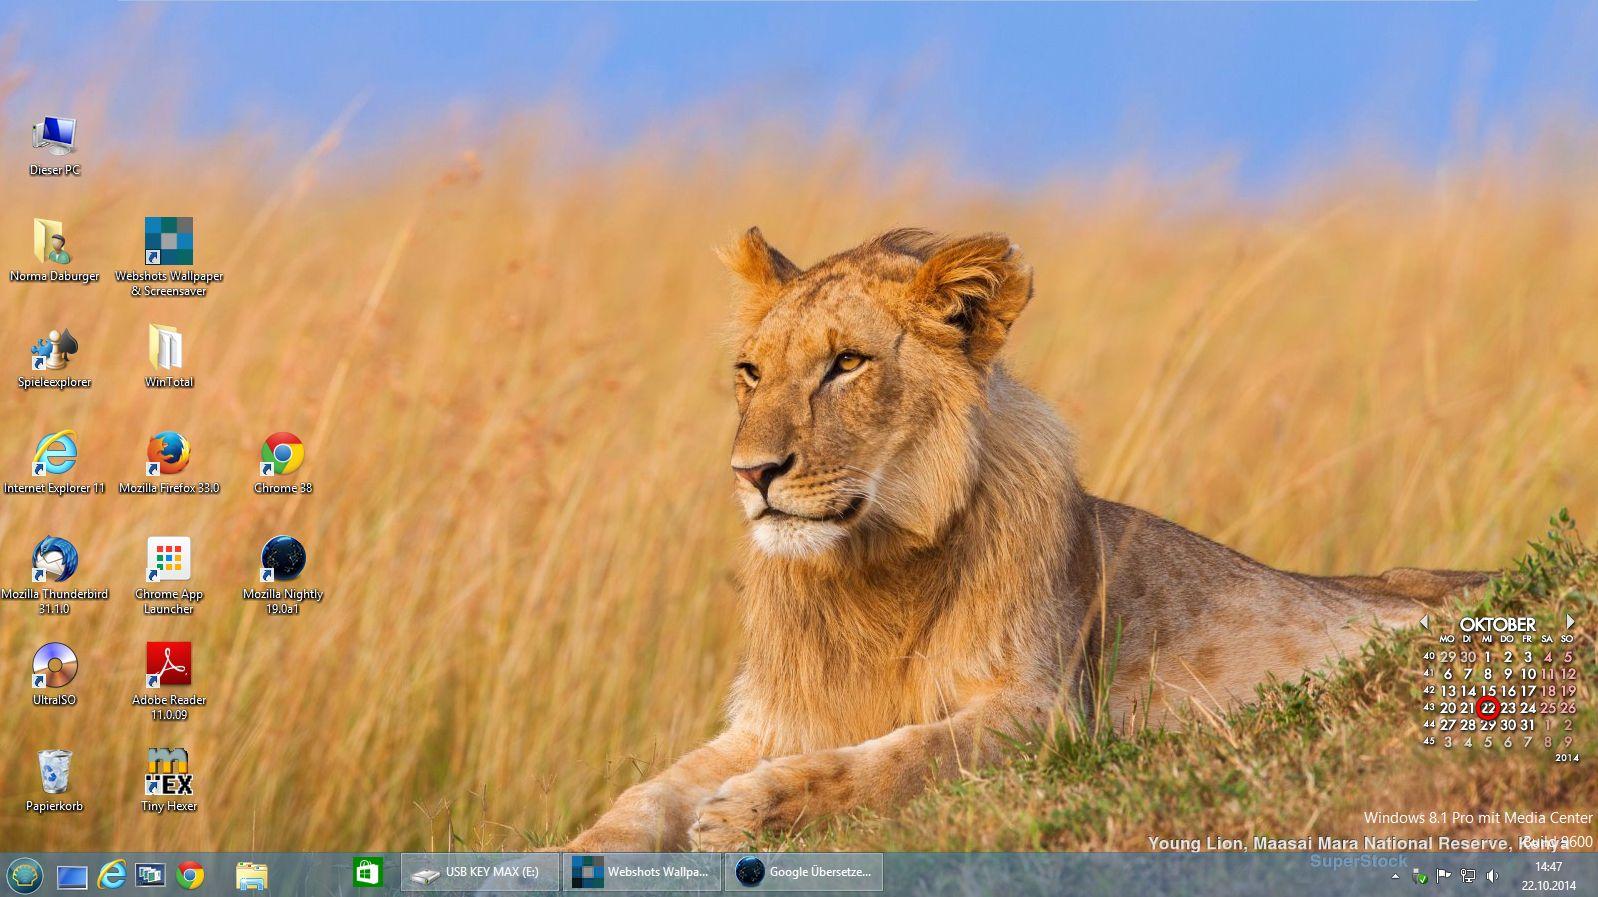 Webshots Wallpaper & Screensaver - Download - Kostenlos ...